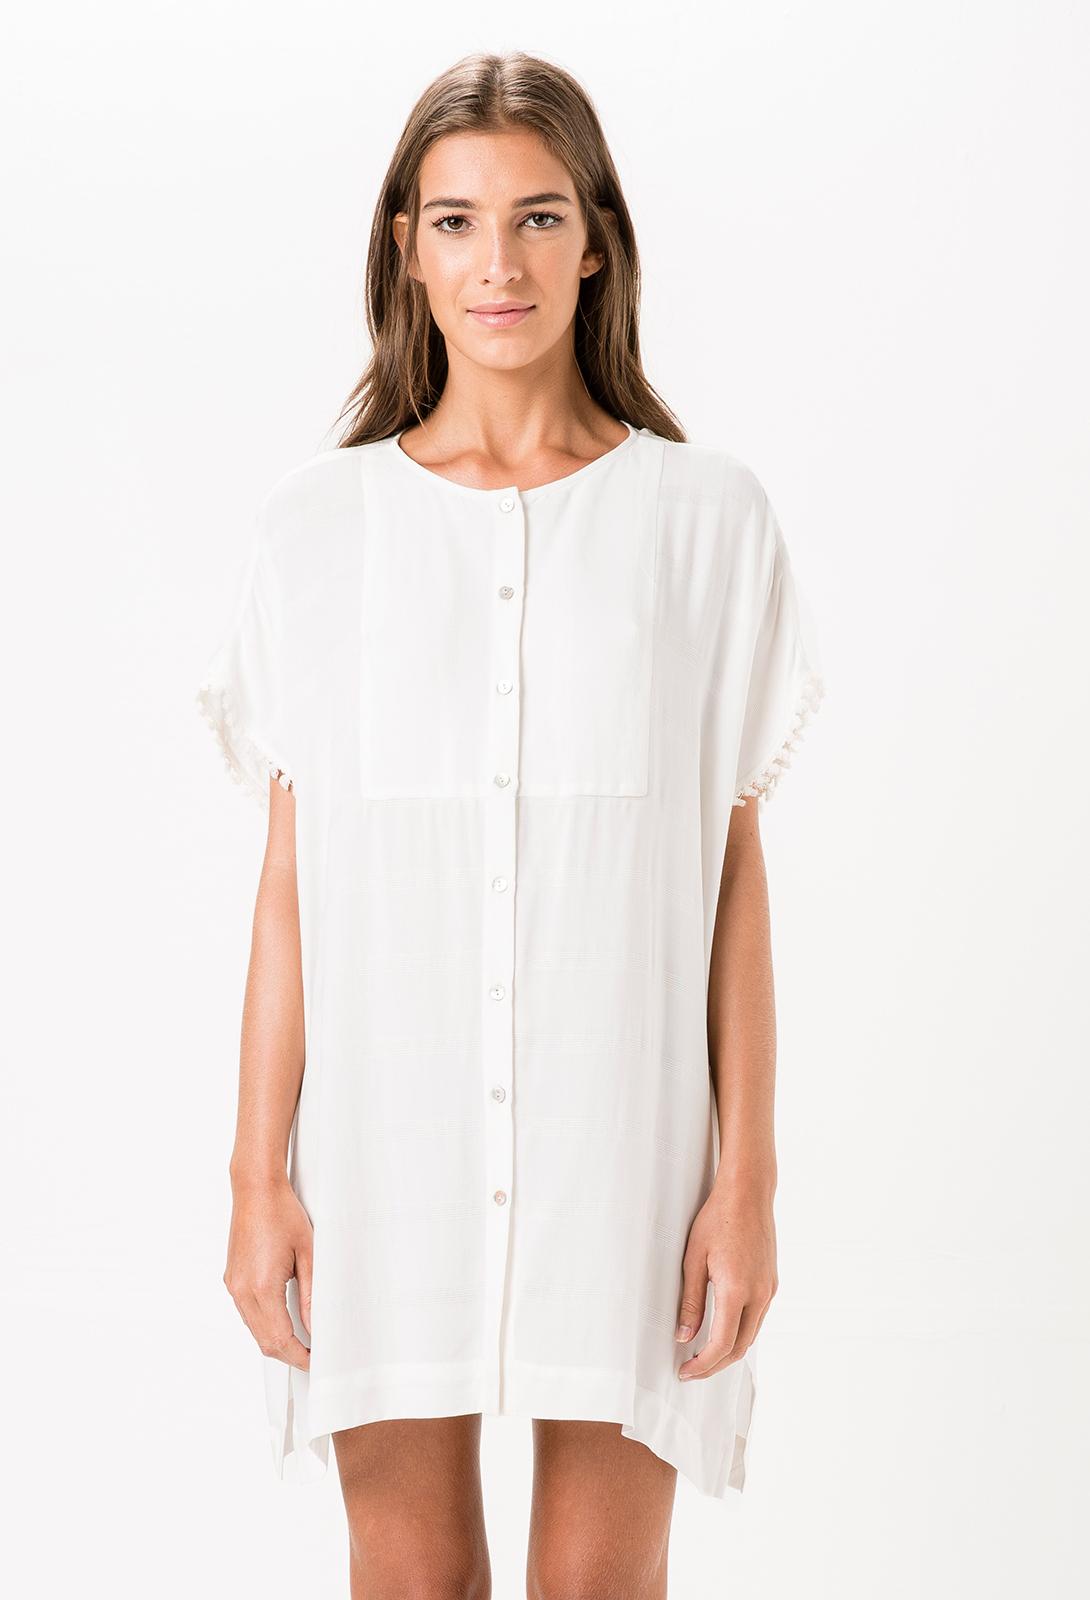 2a0341ae40e7 ... παραλία με κρόσια στις άκρες - KILAUEA  Λευκό φόρεμα-πουκαμίσα ...